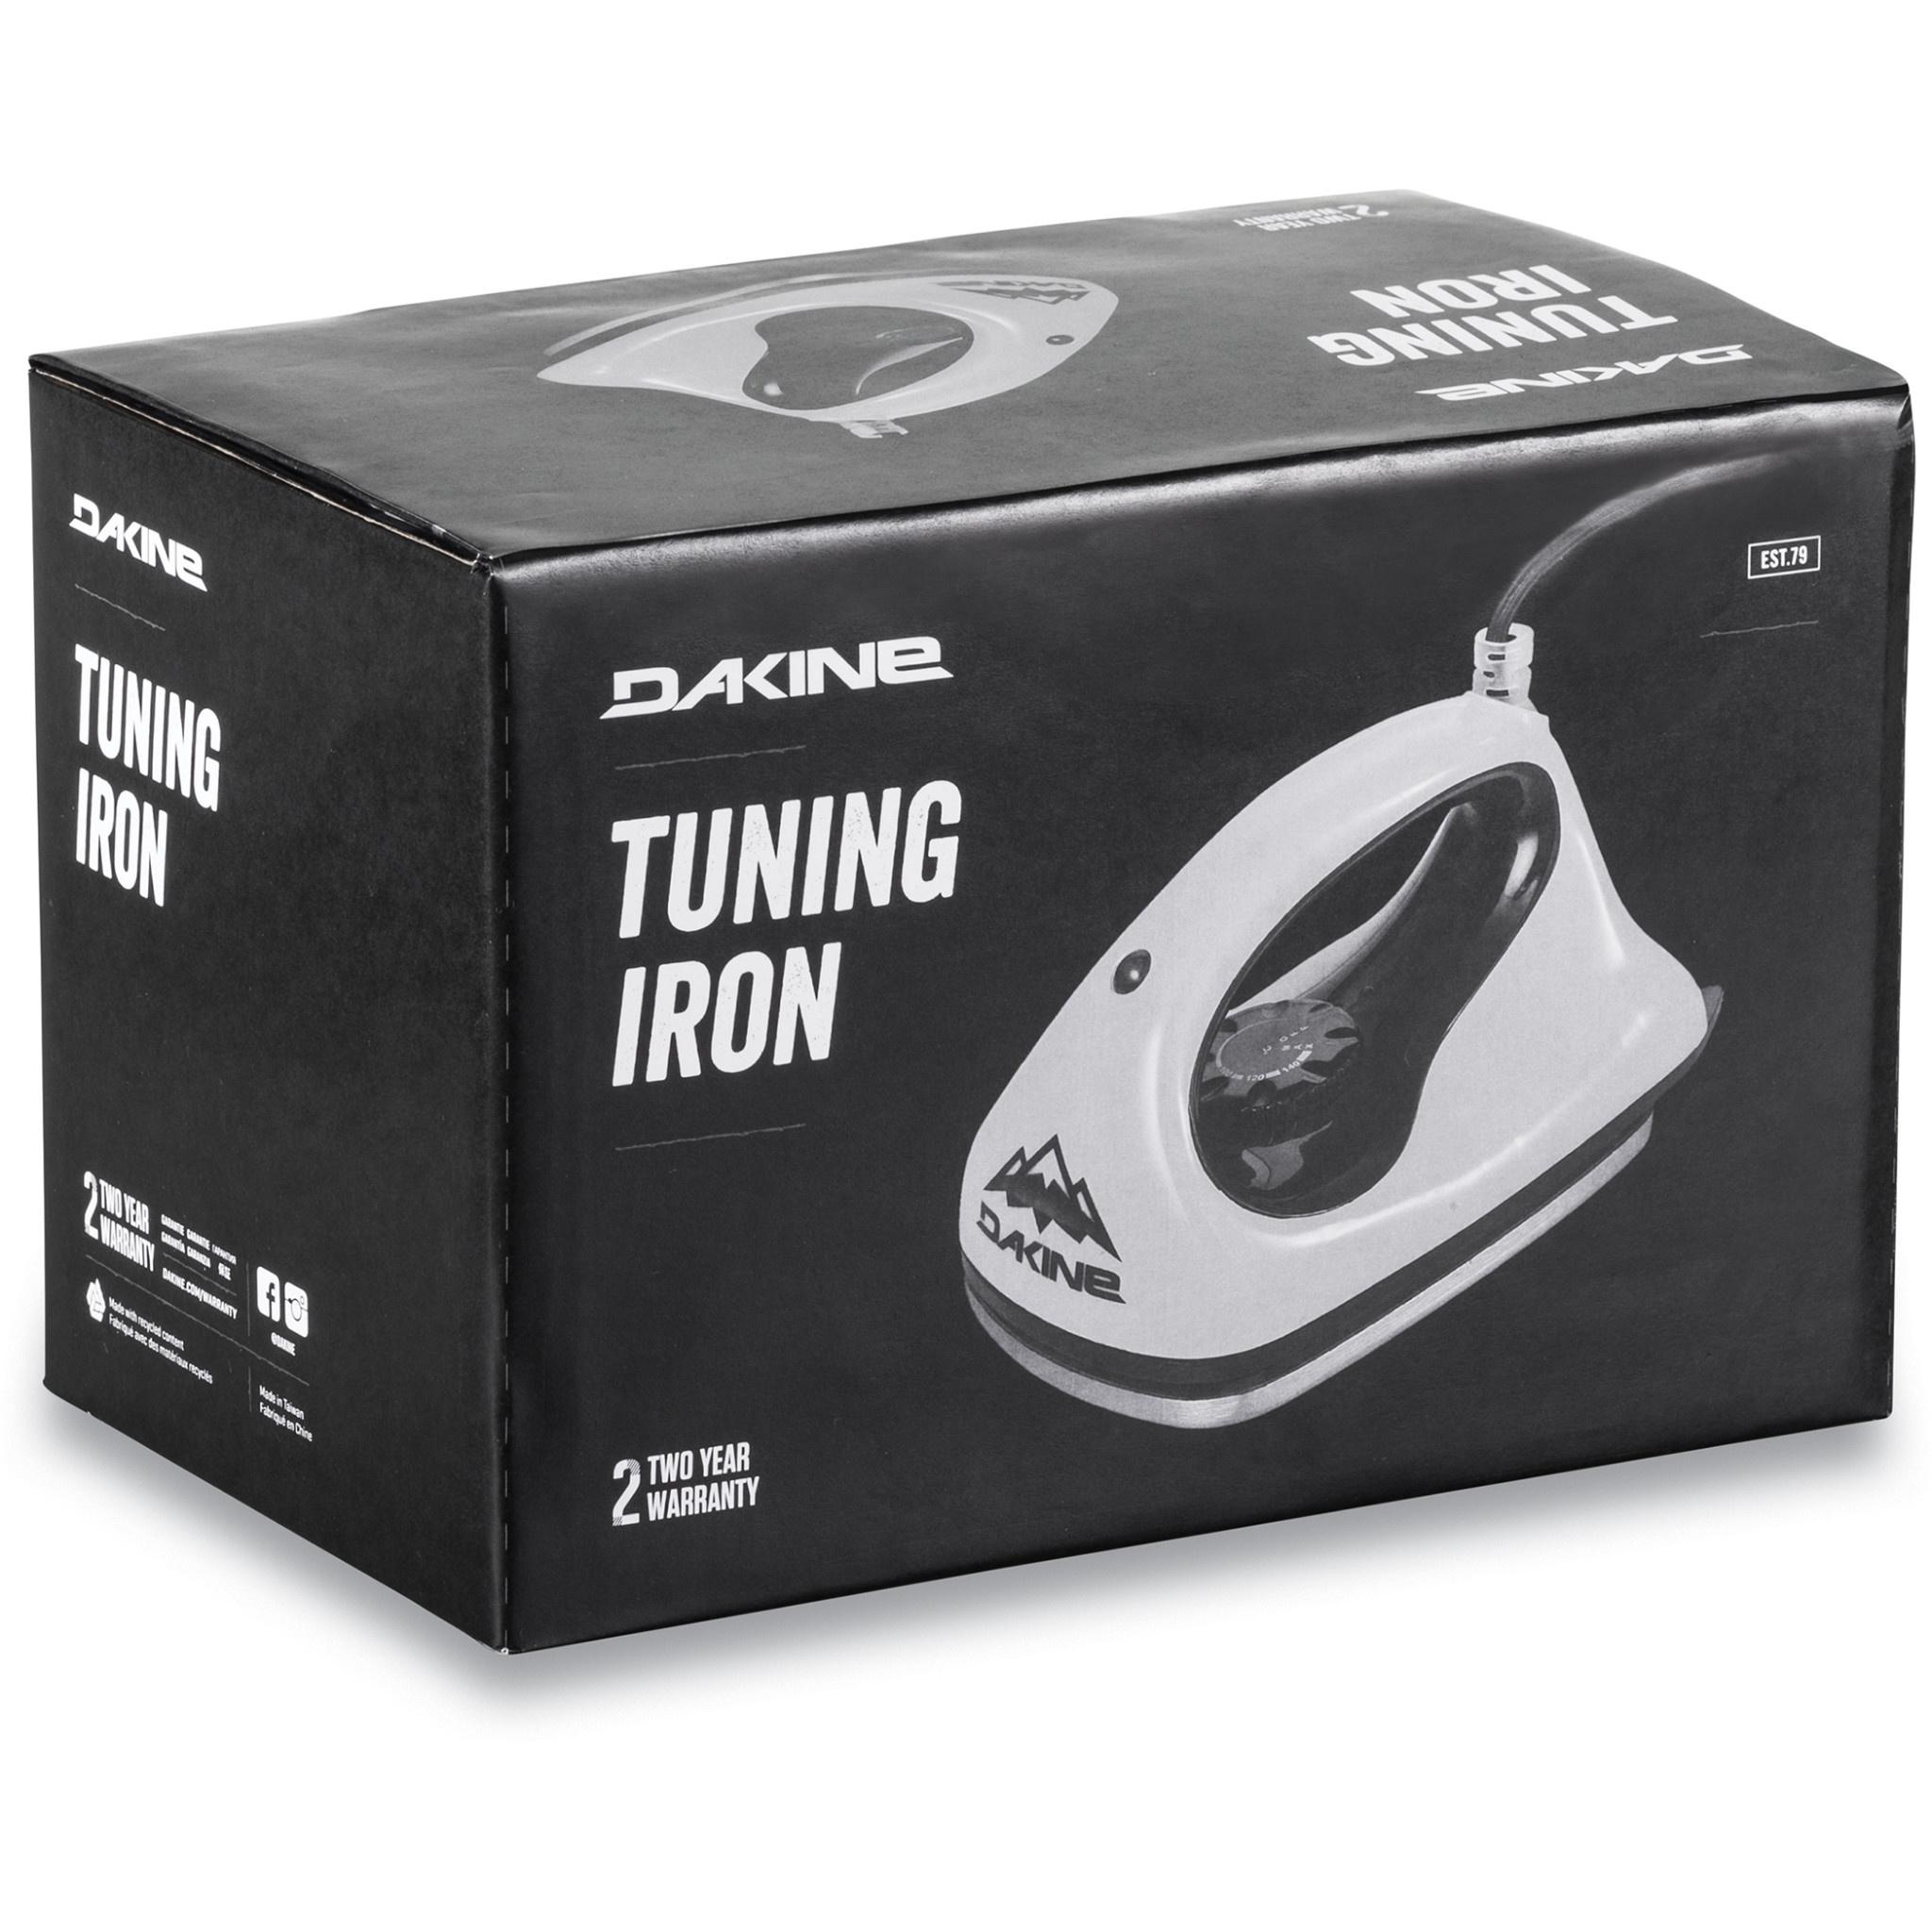 Dakine Dakine Adjustable Tuning Iron - Green